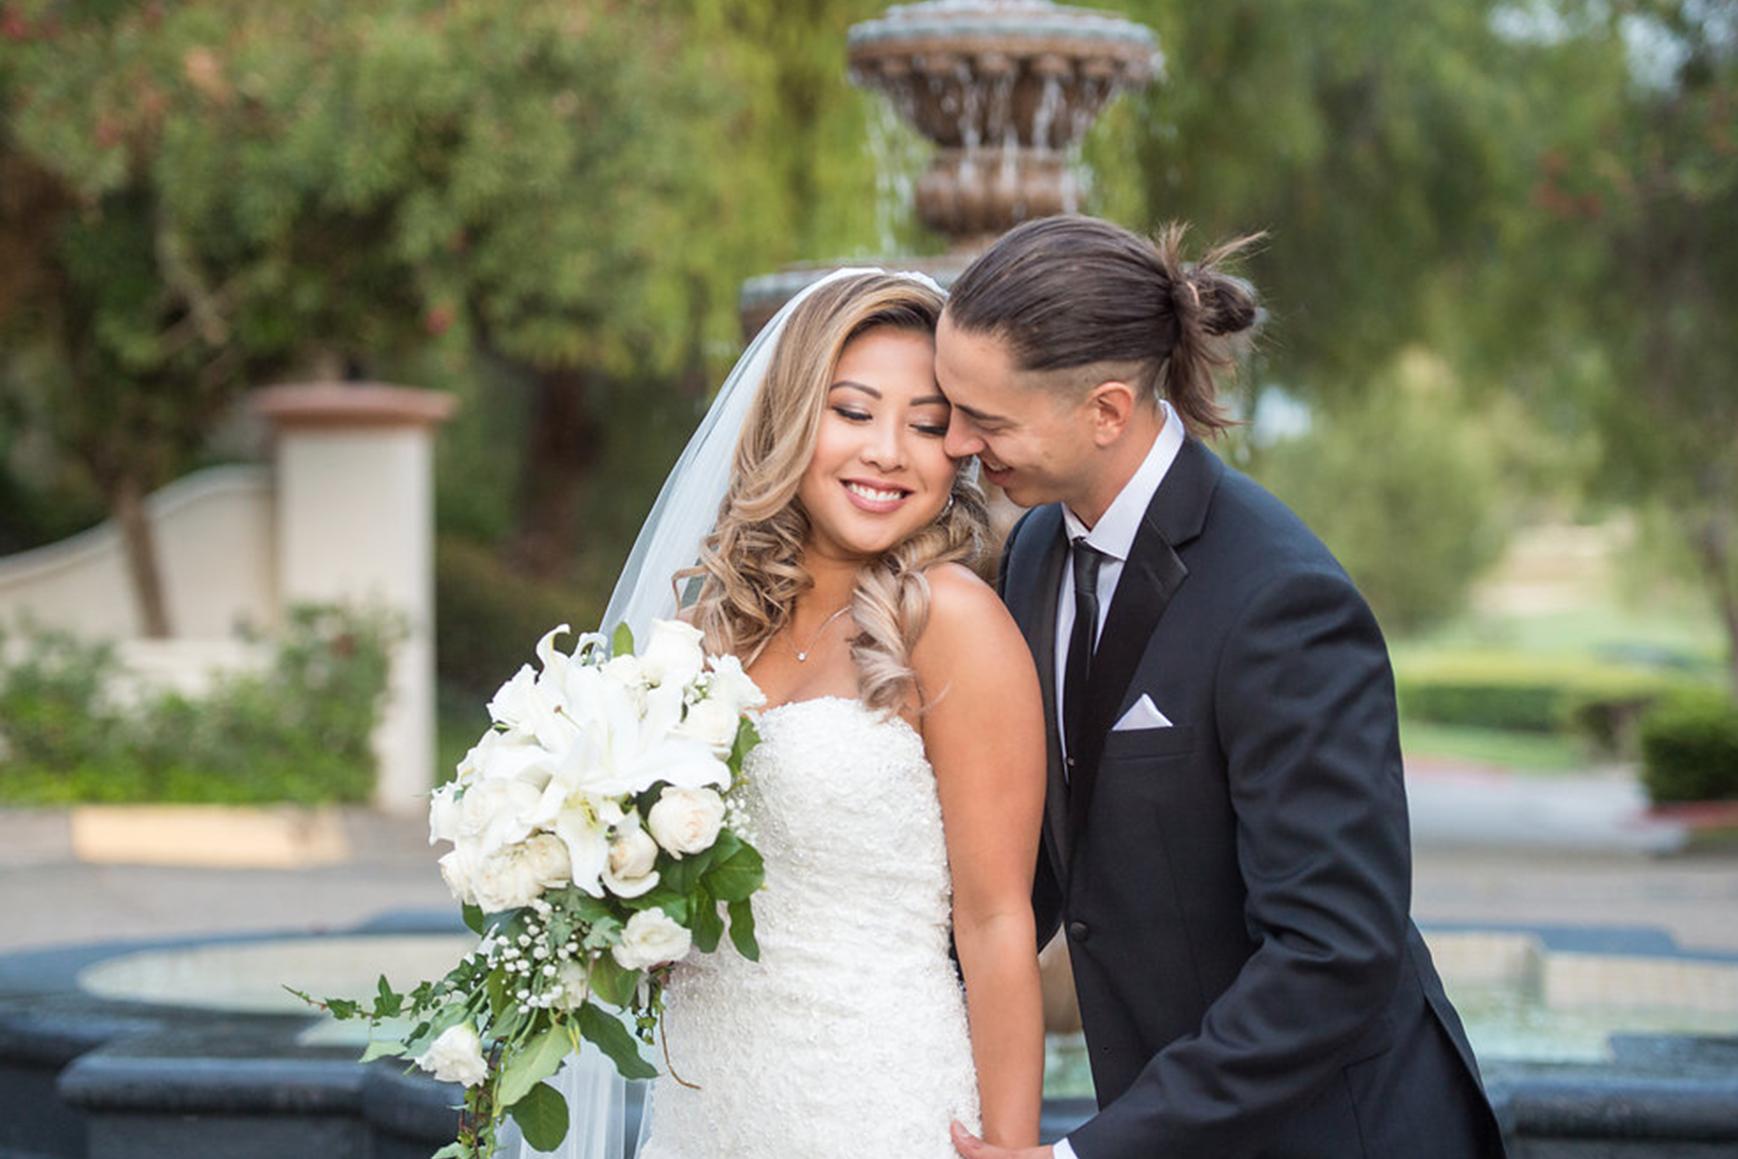 Intimate moments - Menifee Lakes - Menifee, California - Riverside County - Wedgewood Weddings